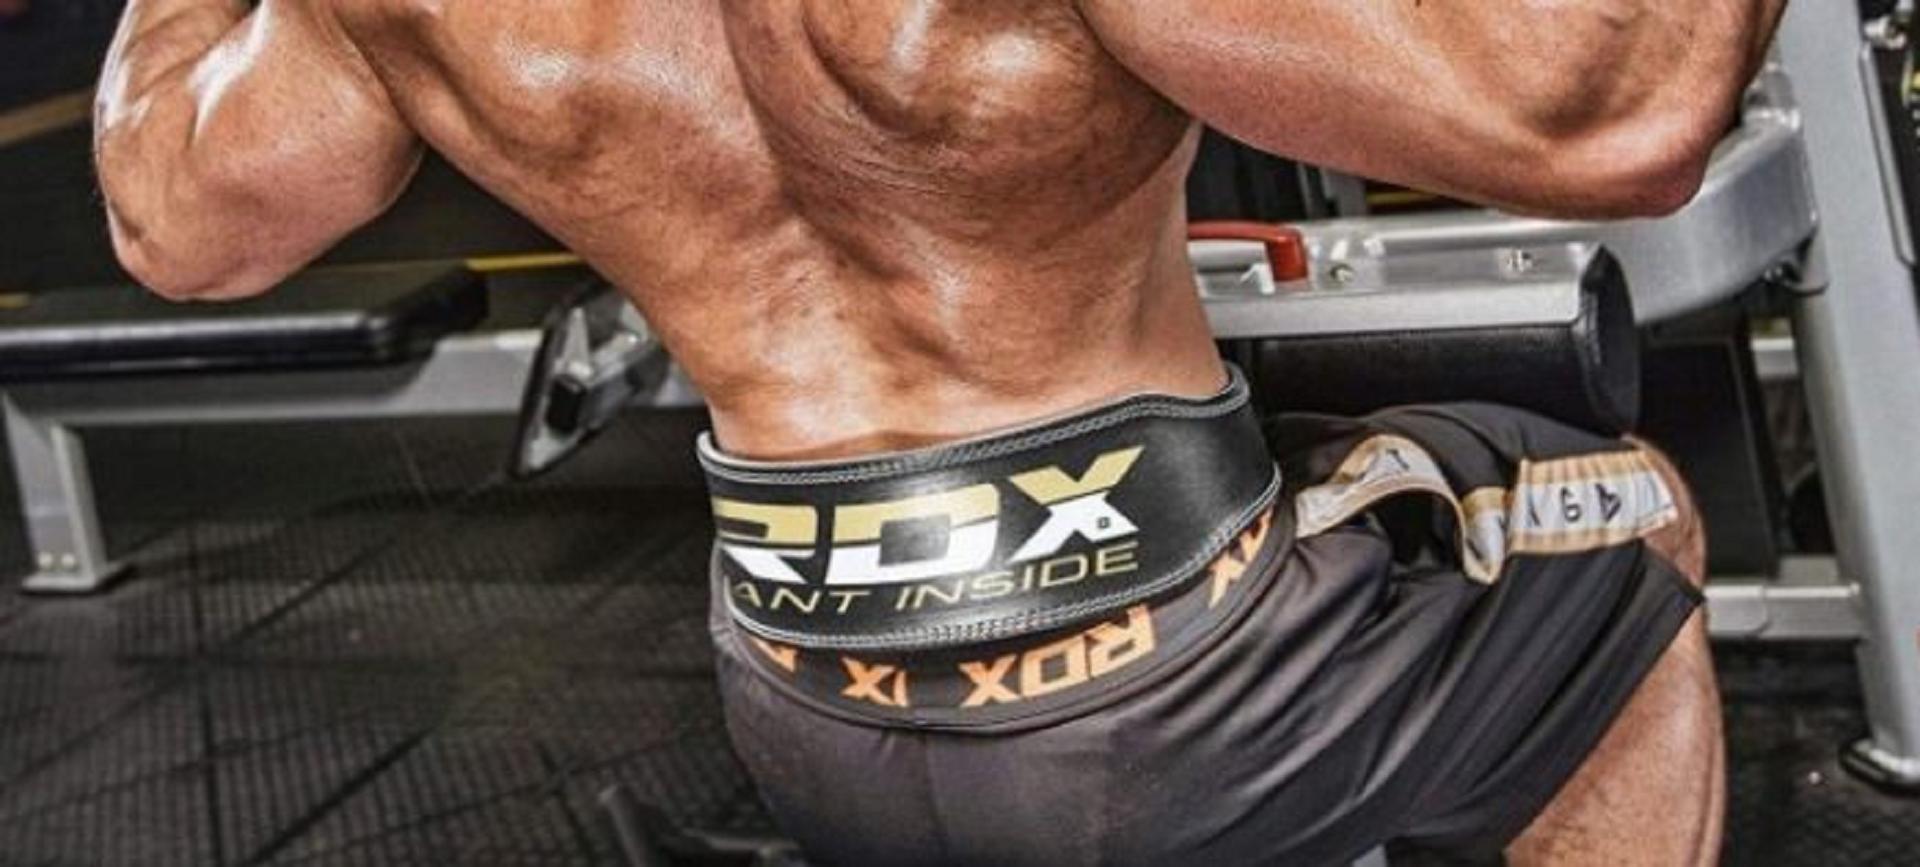 rdx weightlifting belt